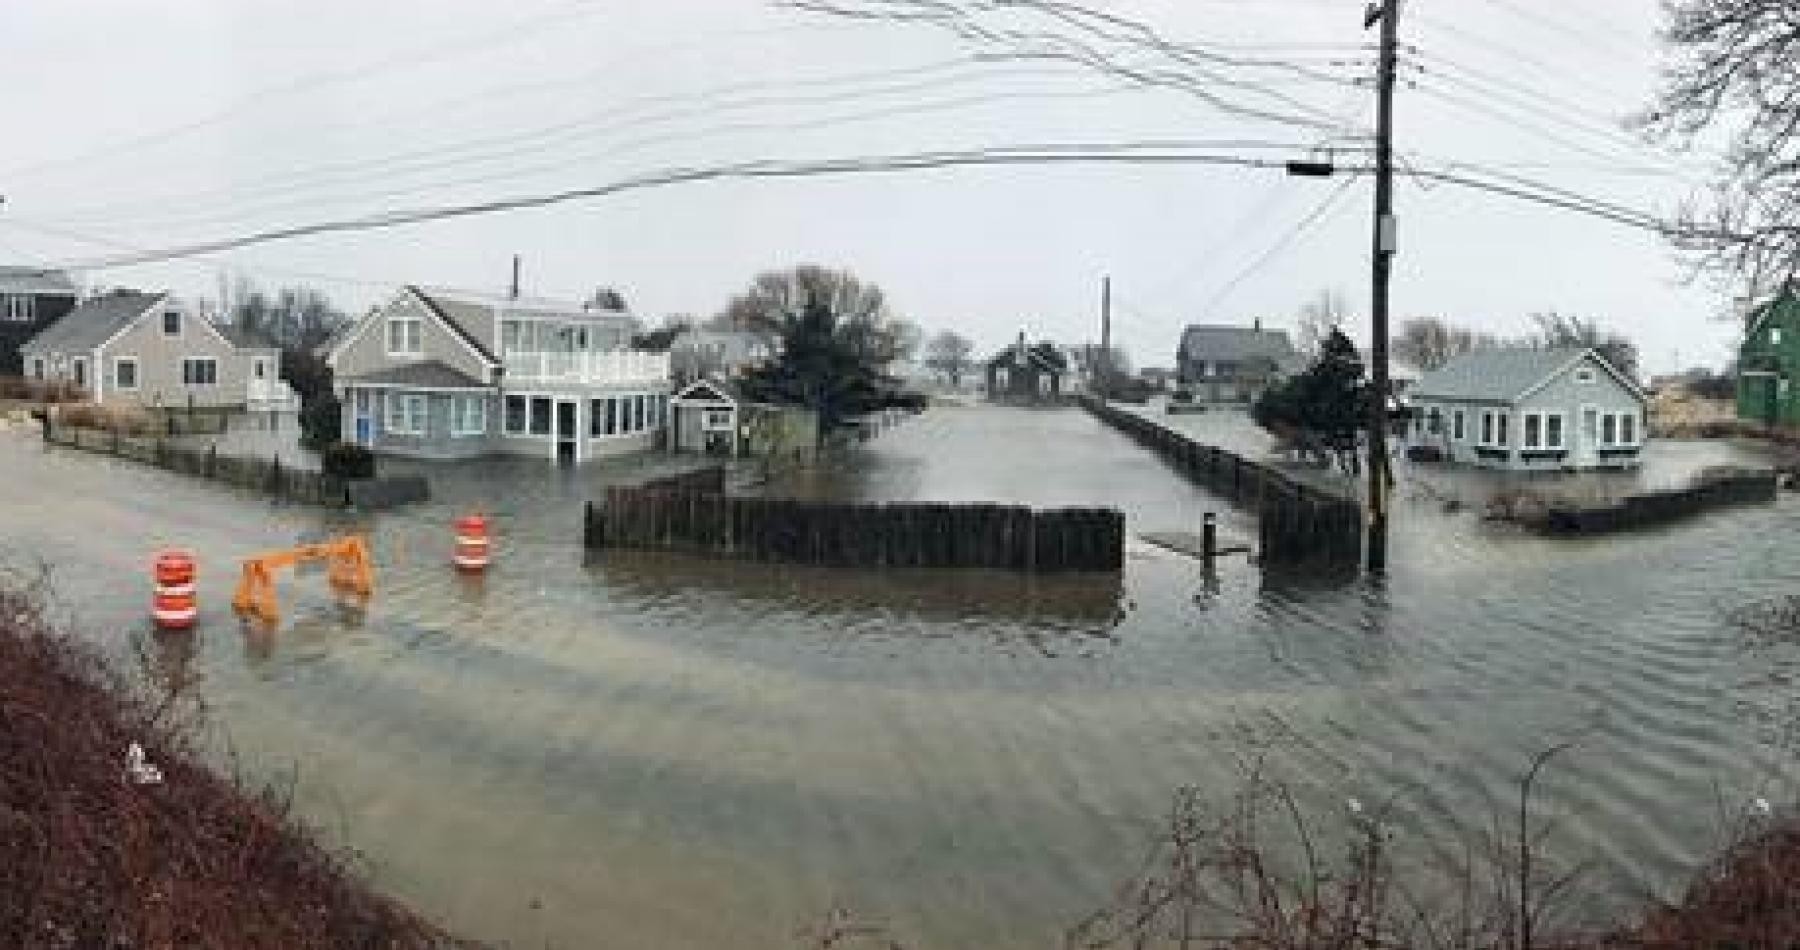 Street flooding in Dennis after 2018 storm. Photo credit: Rebecca Westgate